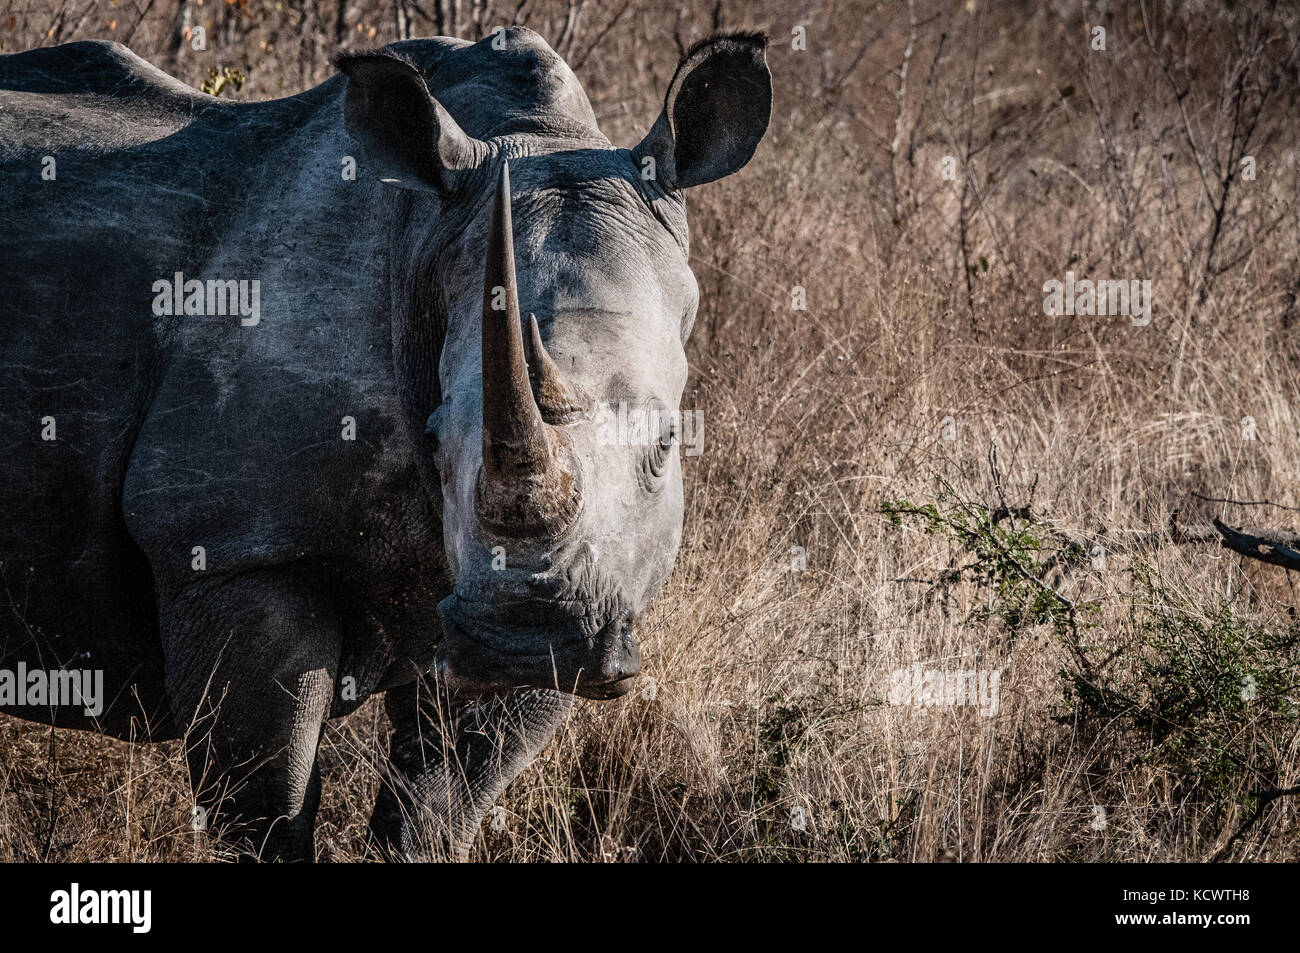 rhino at kruger park - Stock Image